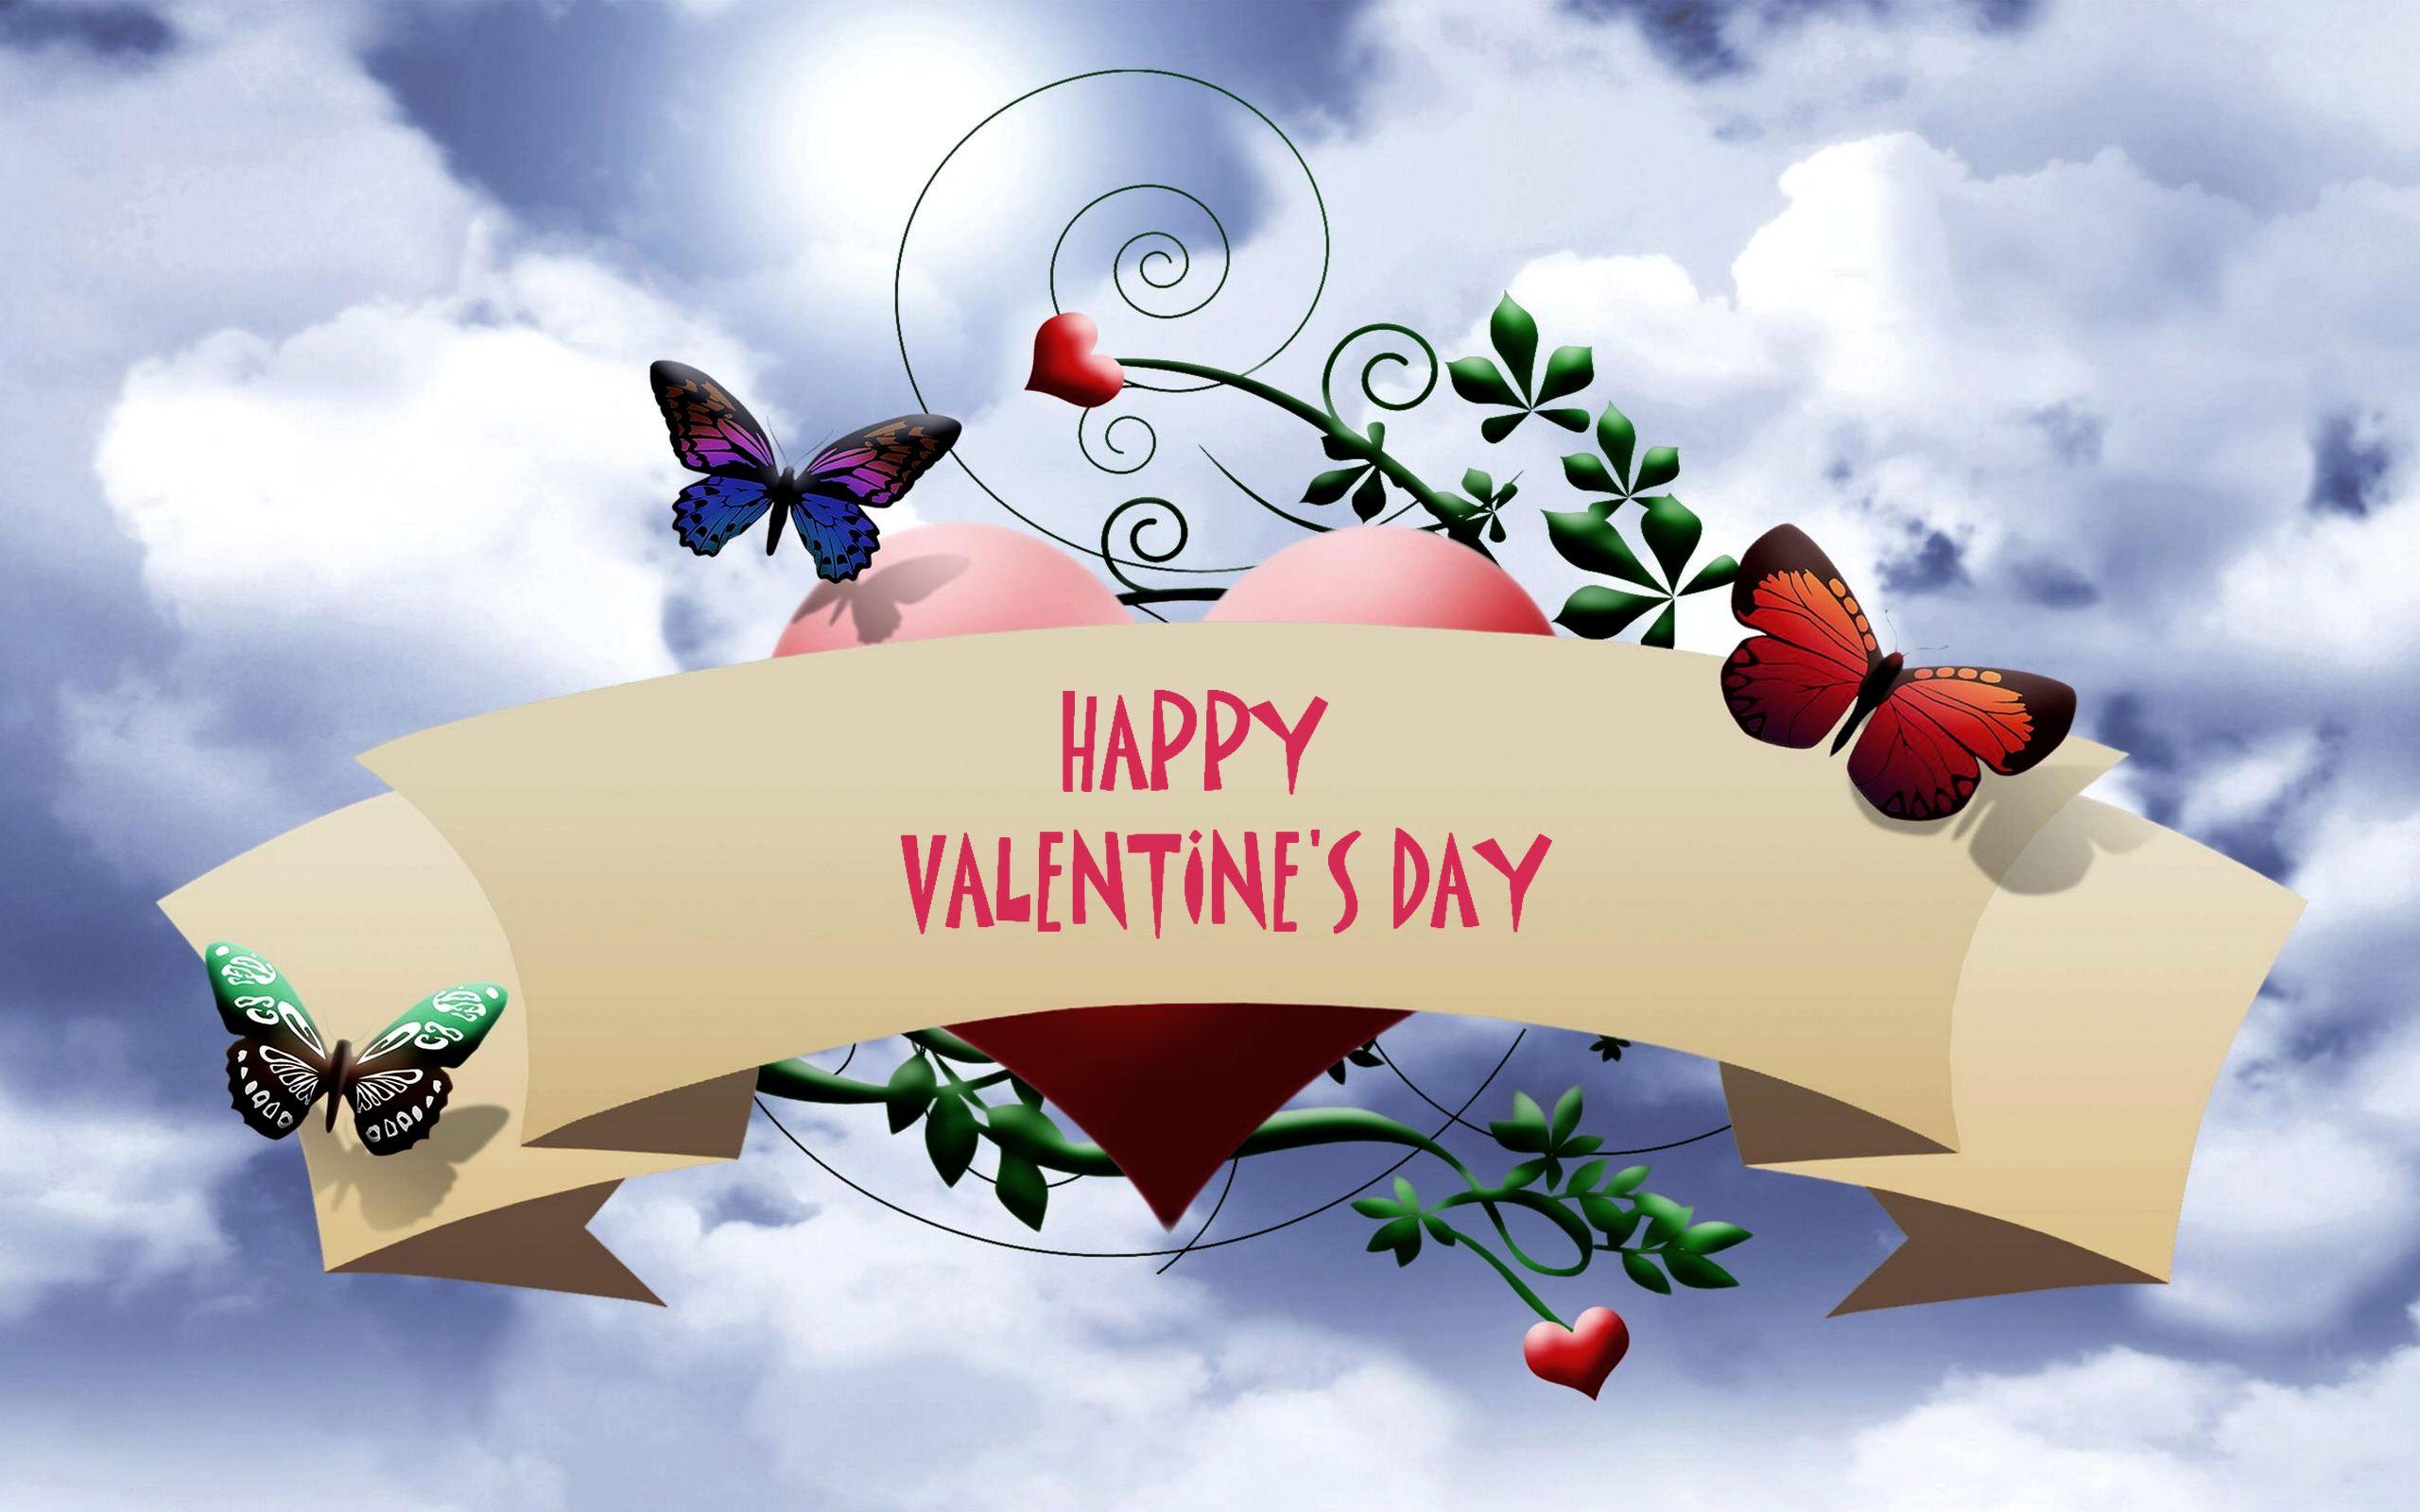 Cute Happy Valentines Day Wallpaper 2015 Happy Valentine S Day Wallpapers Hd Pixelstalk Net